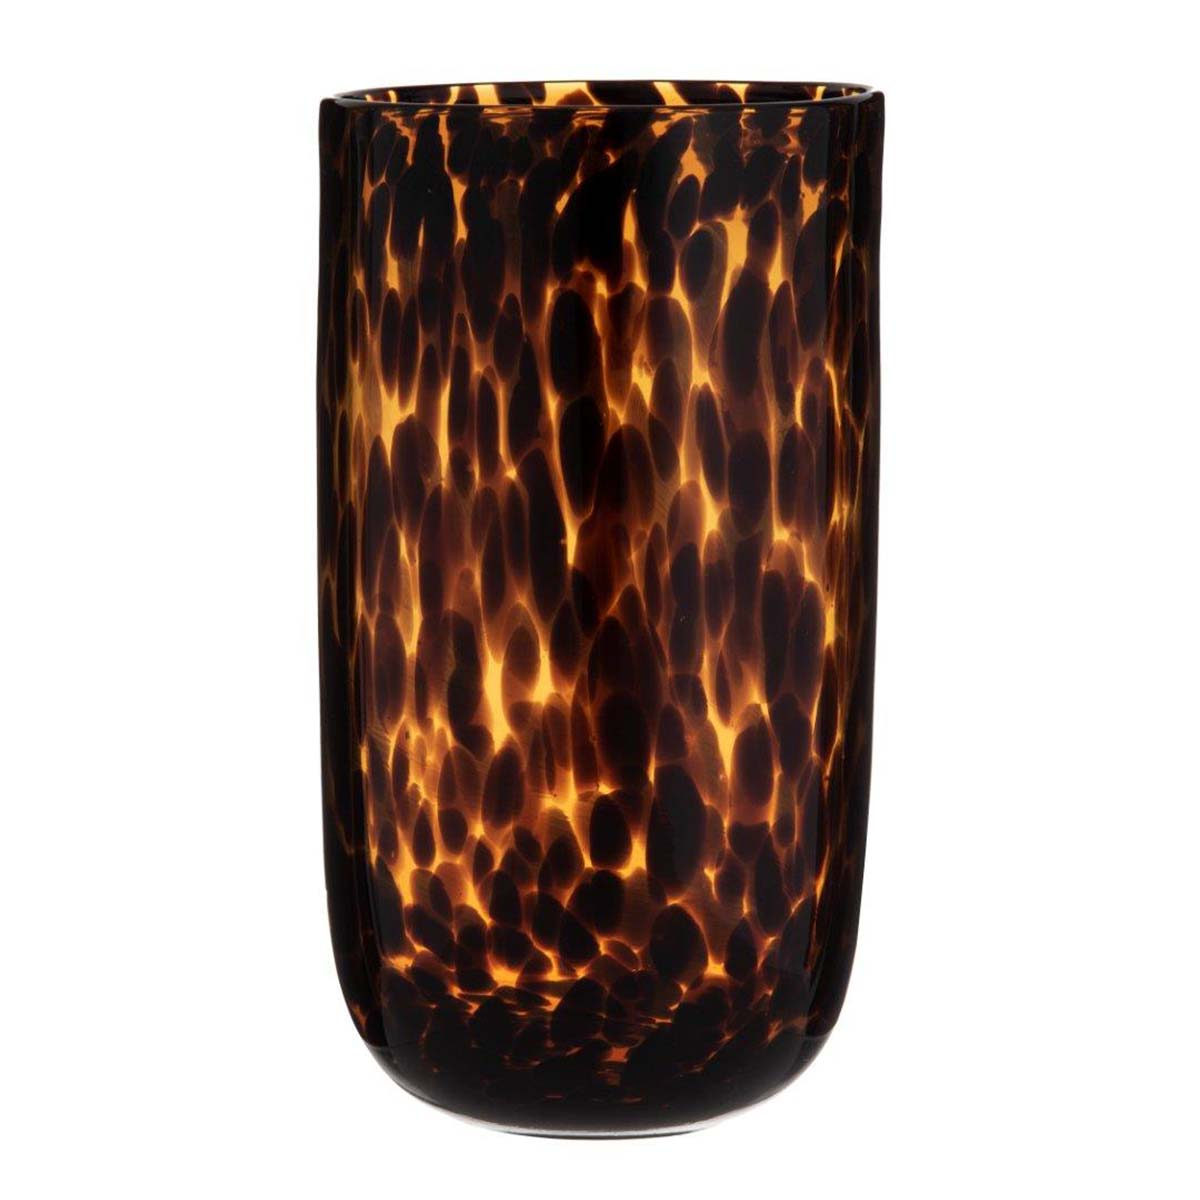 EMBER VASE 17X30CM in amber/black